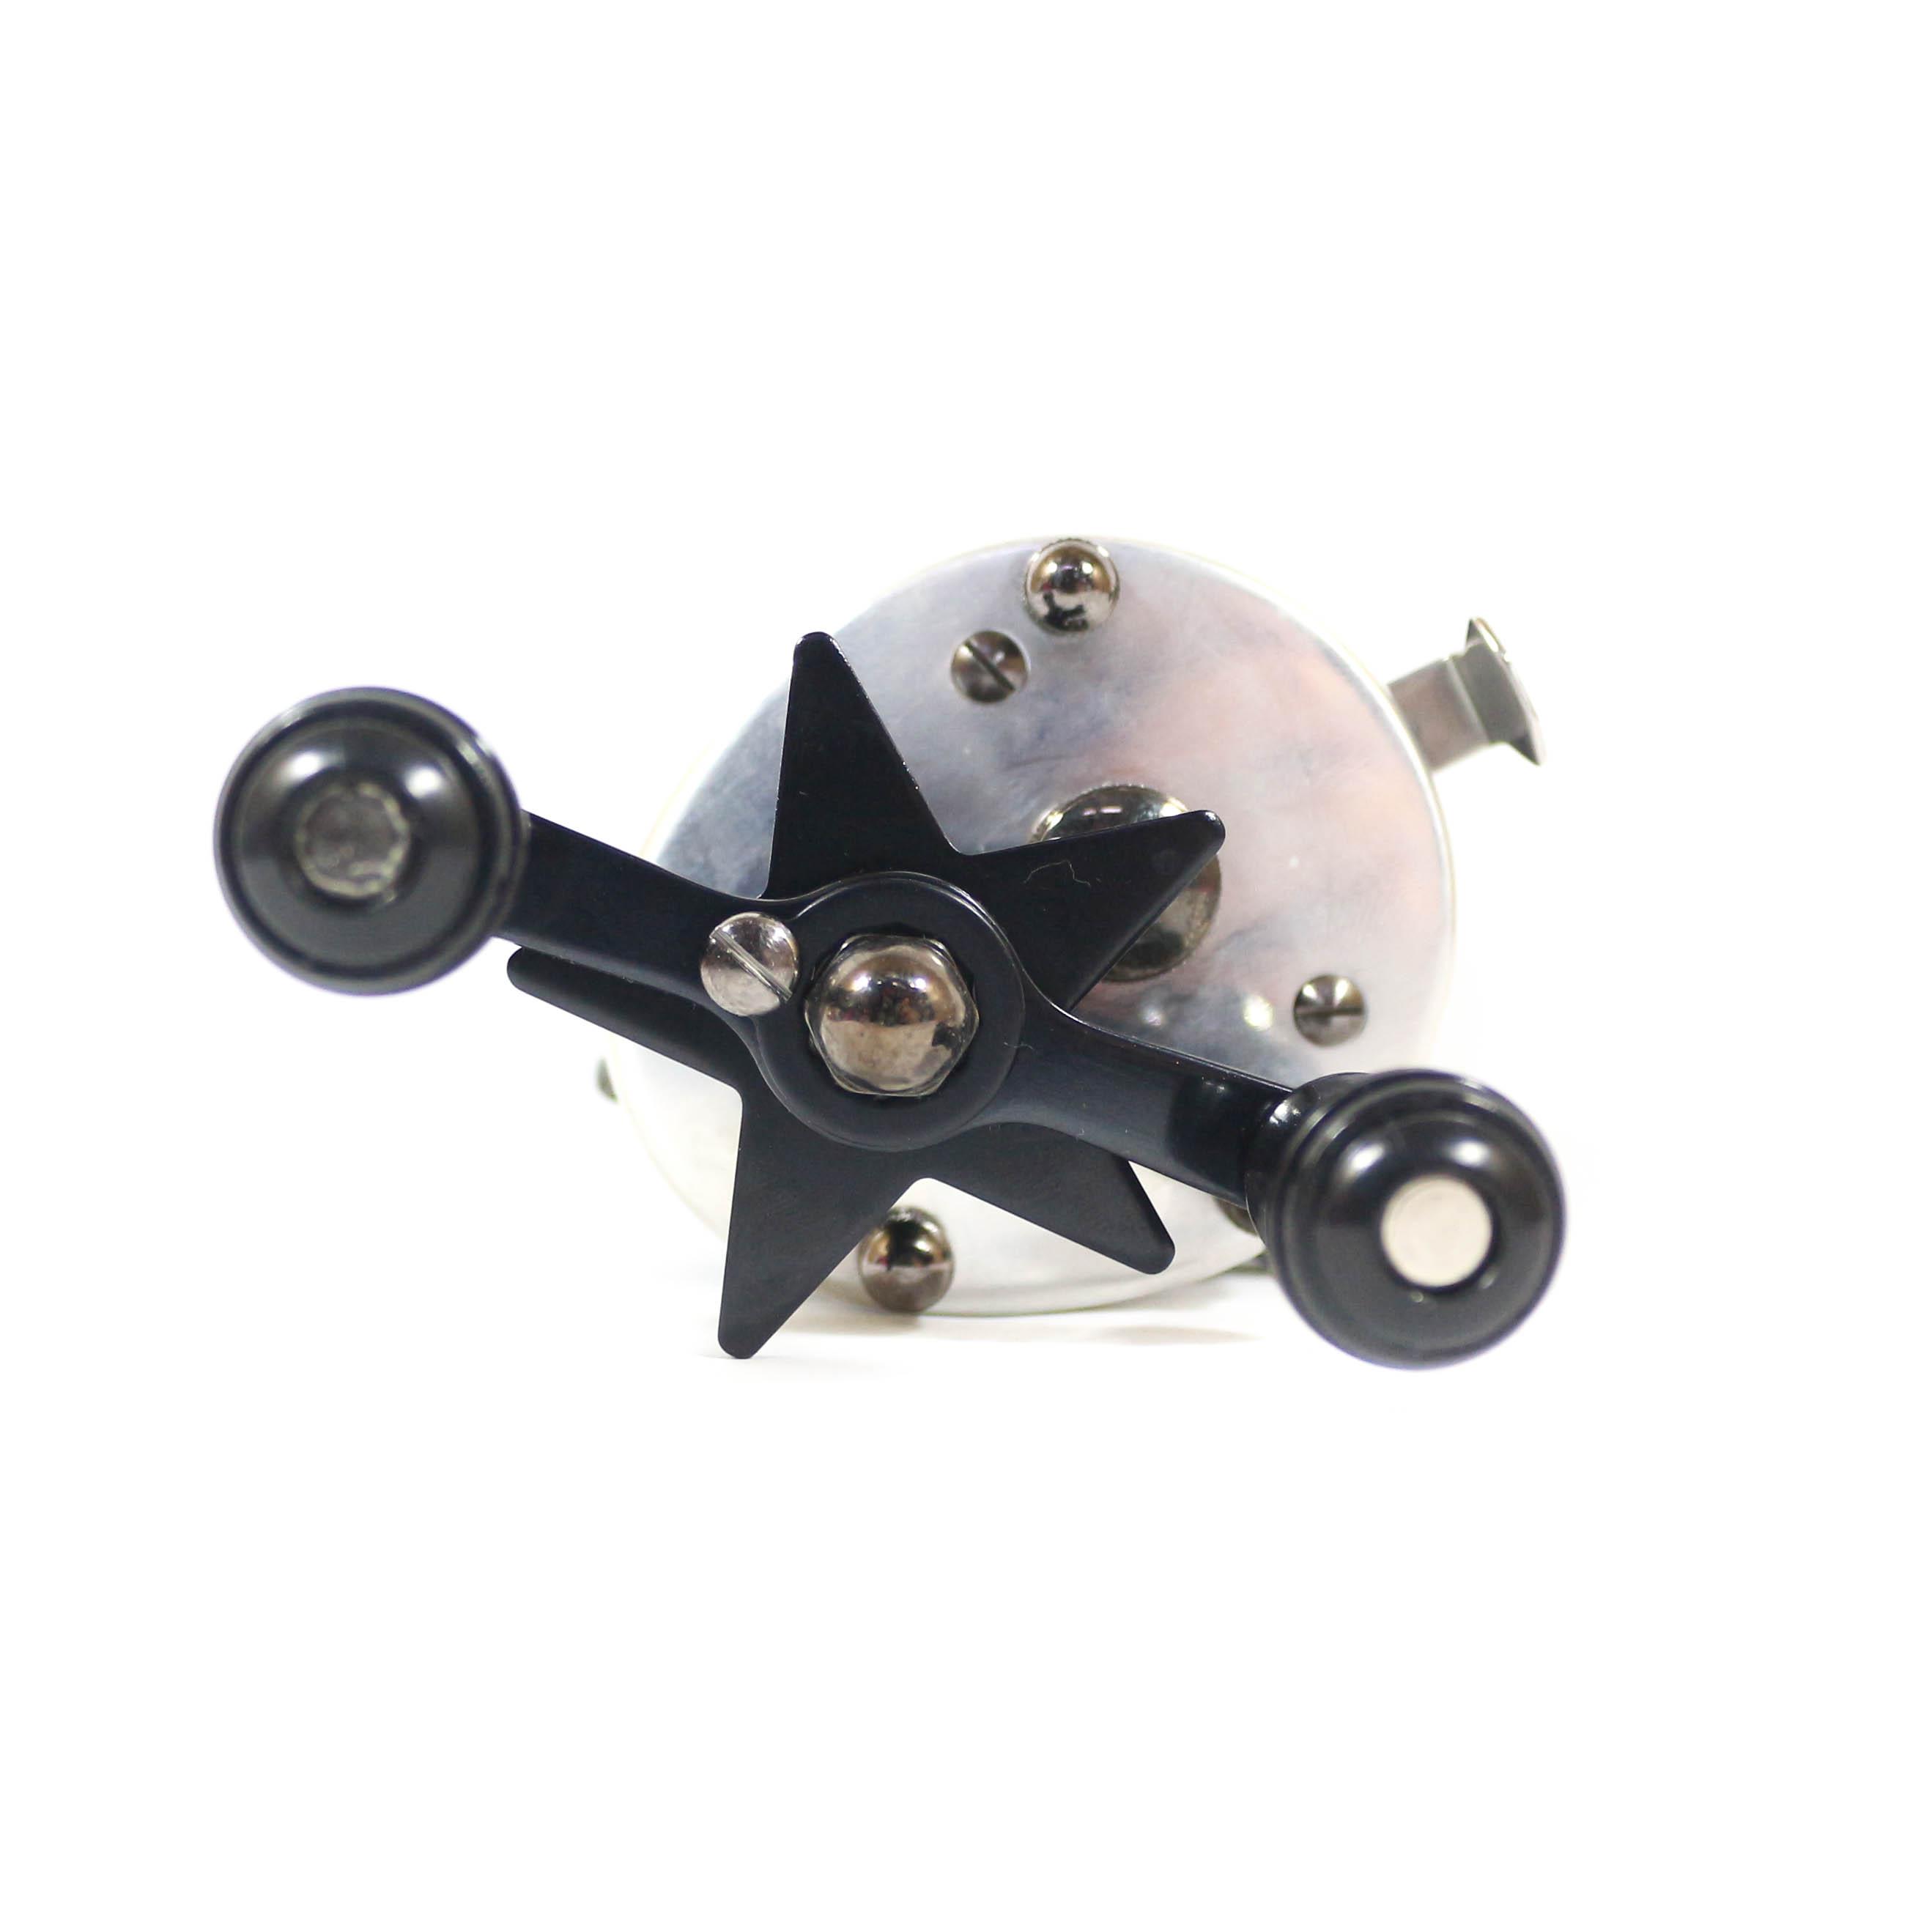 Frog Baitcast Reel Toy Machine Silver (2010)